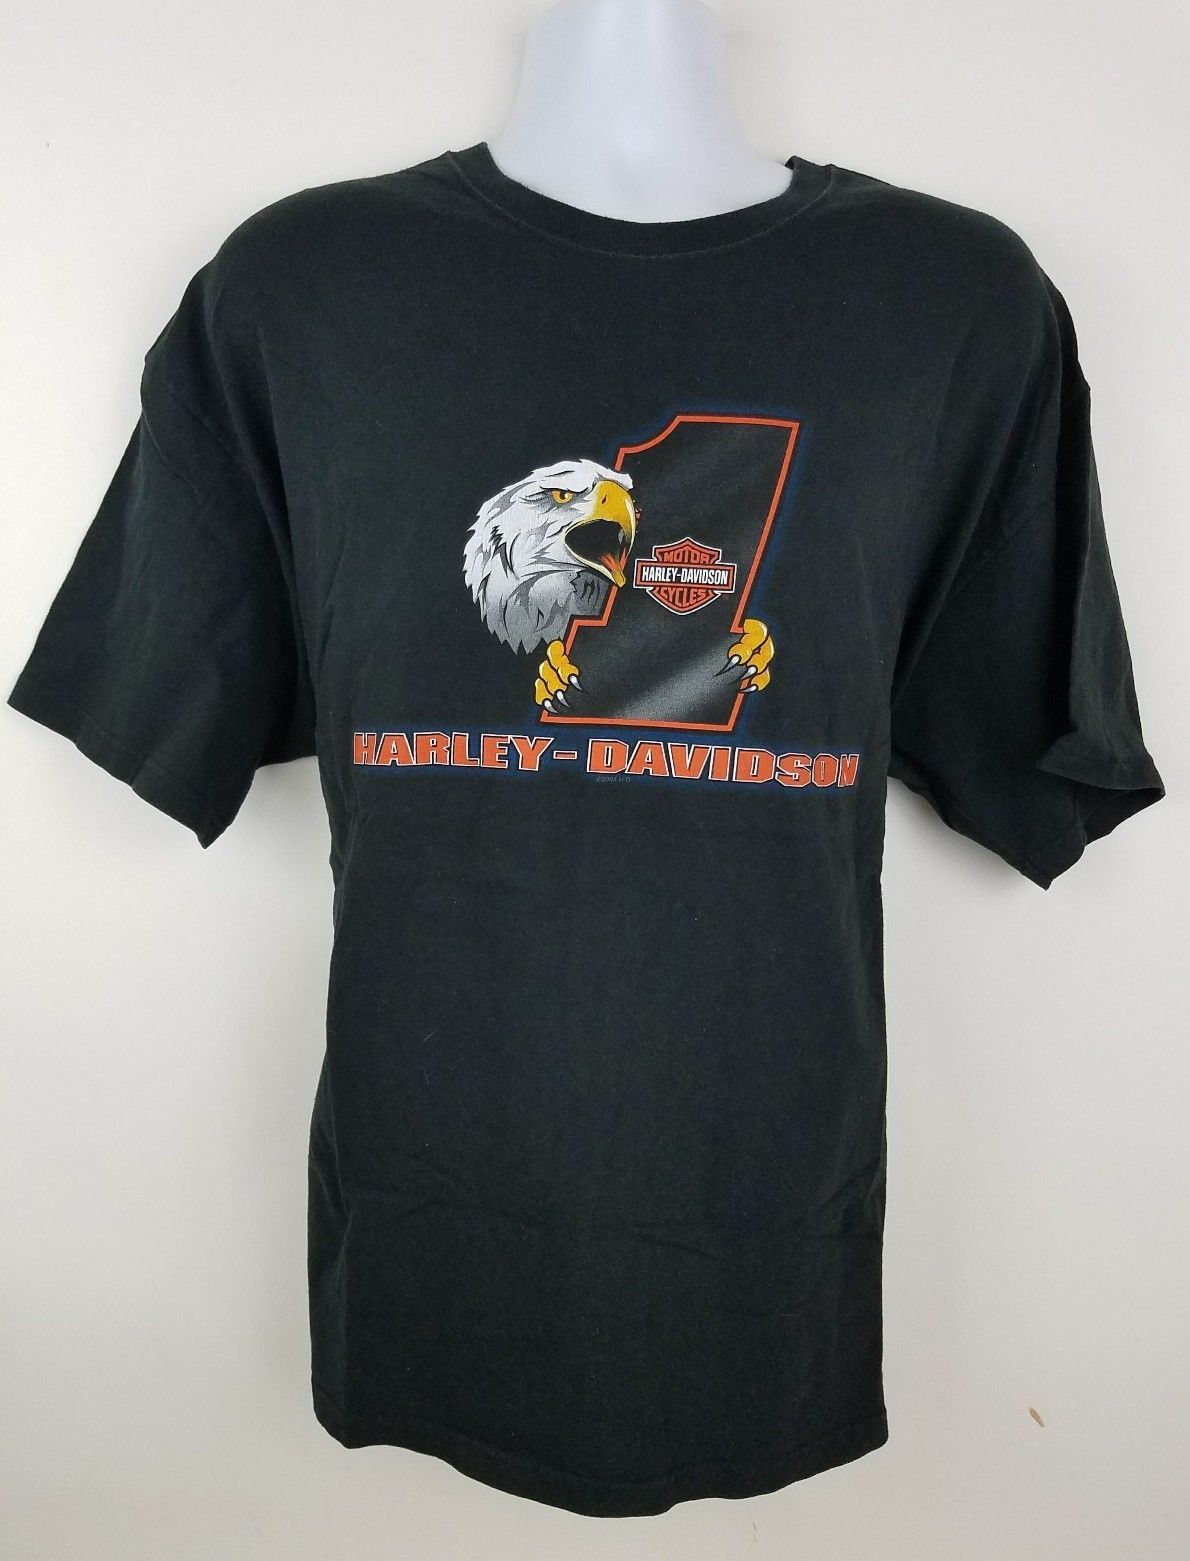 Harley Davidson Plainfield Indiana I-70 Black S/S Men's Motorcycle T Shirt XXL image 2